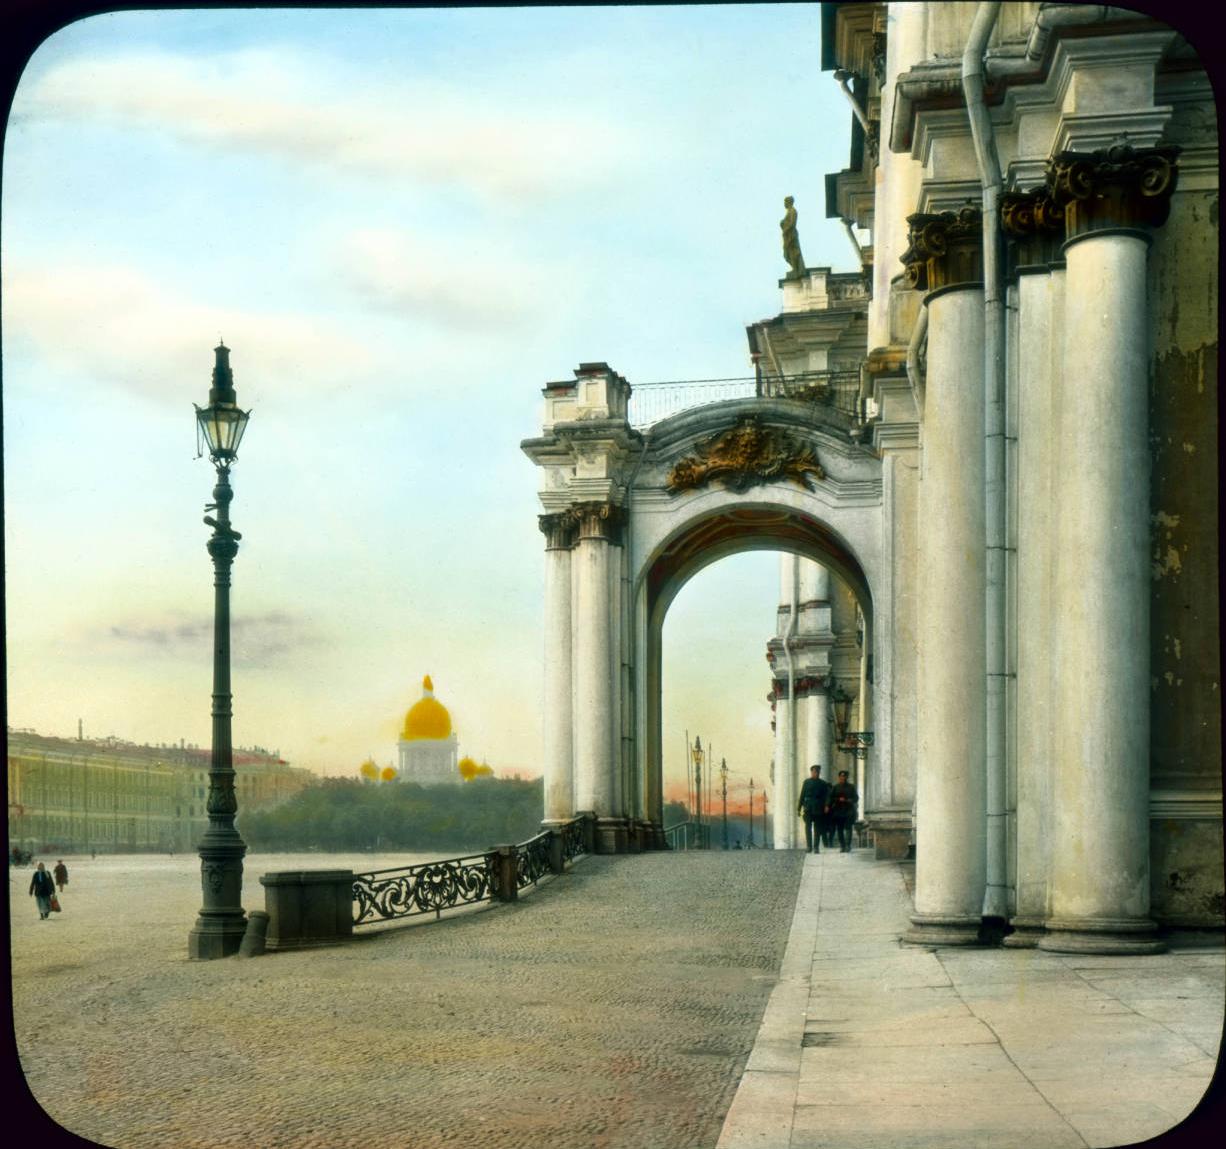 Санкт-Петербург. Эрмитаж (бывший Зимний дворец), вид на вход со стороны Дворцовой площади